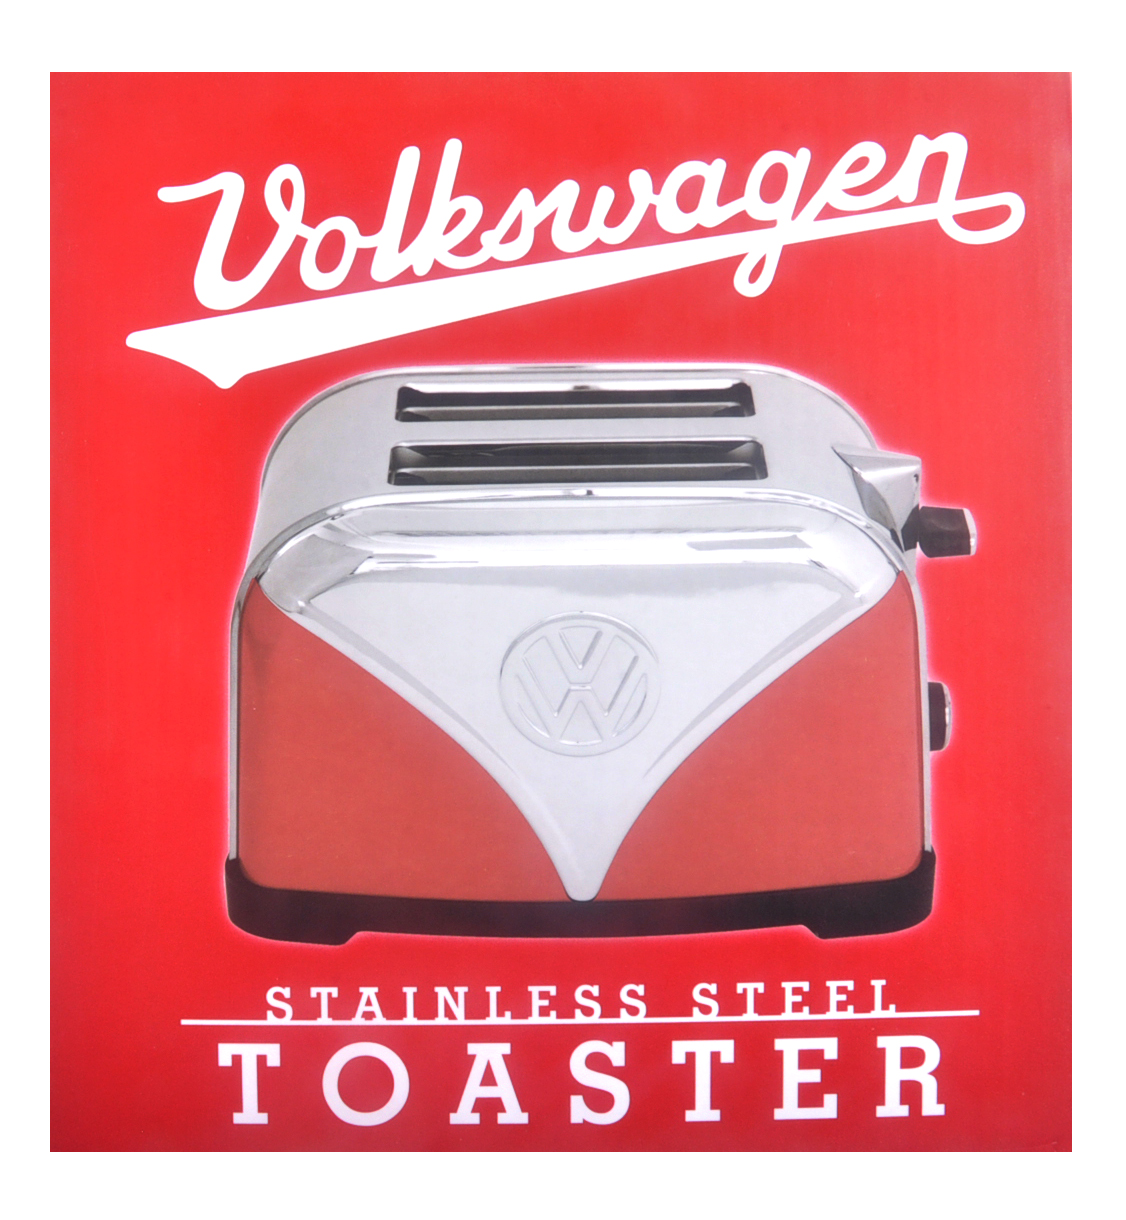 rouge camping car volkswagen grille pain en acier inoxydable. Black Bedroom Furniture Sets. Home Design Ideas